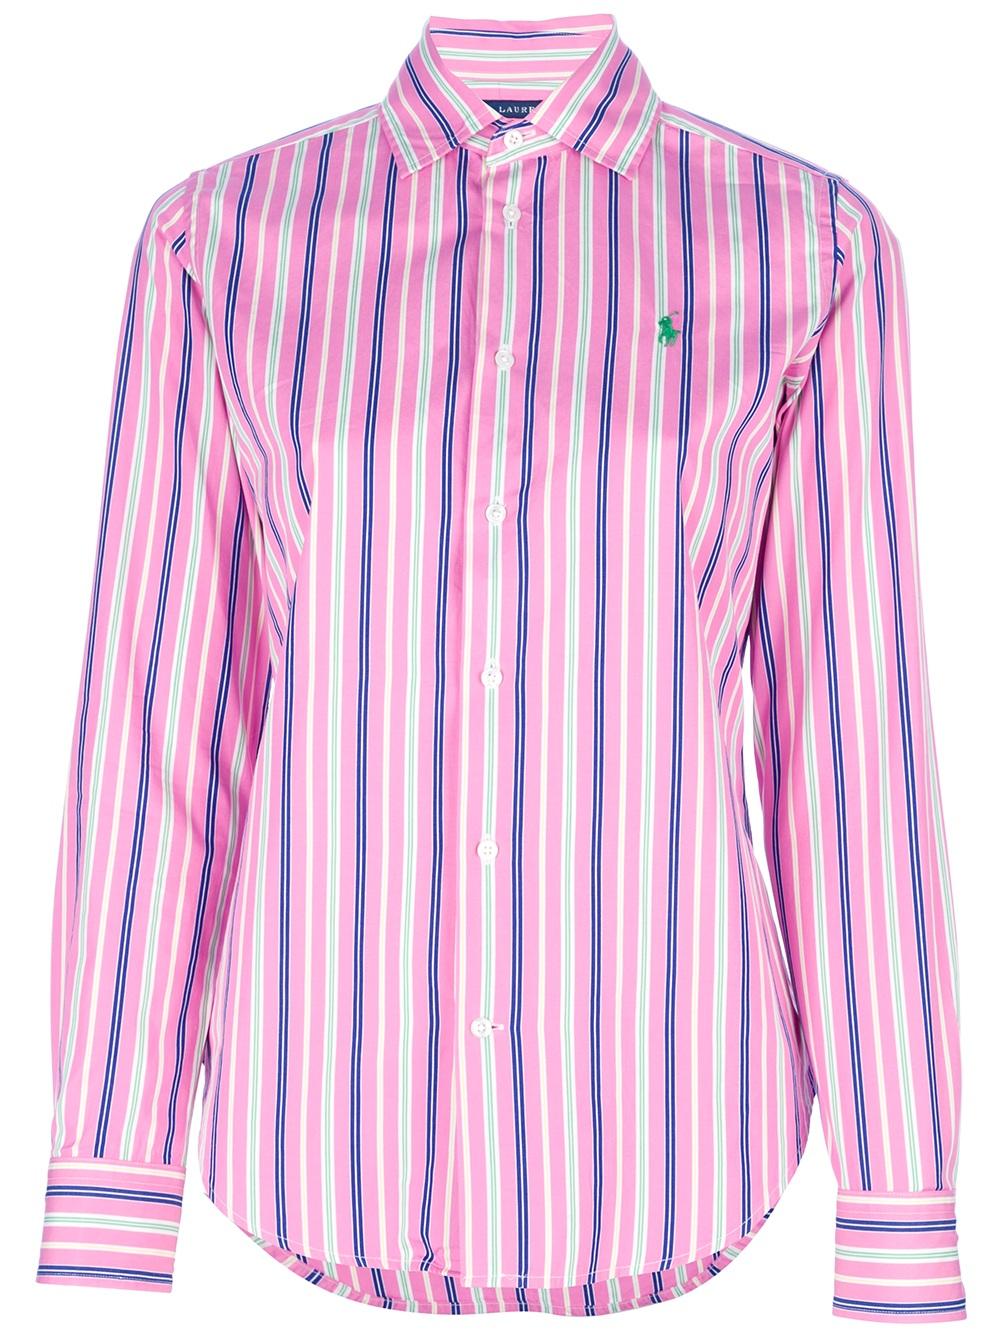 Pink striped shirt custom shirt for Pink white striped shirt